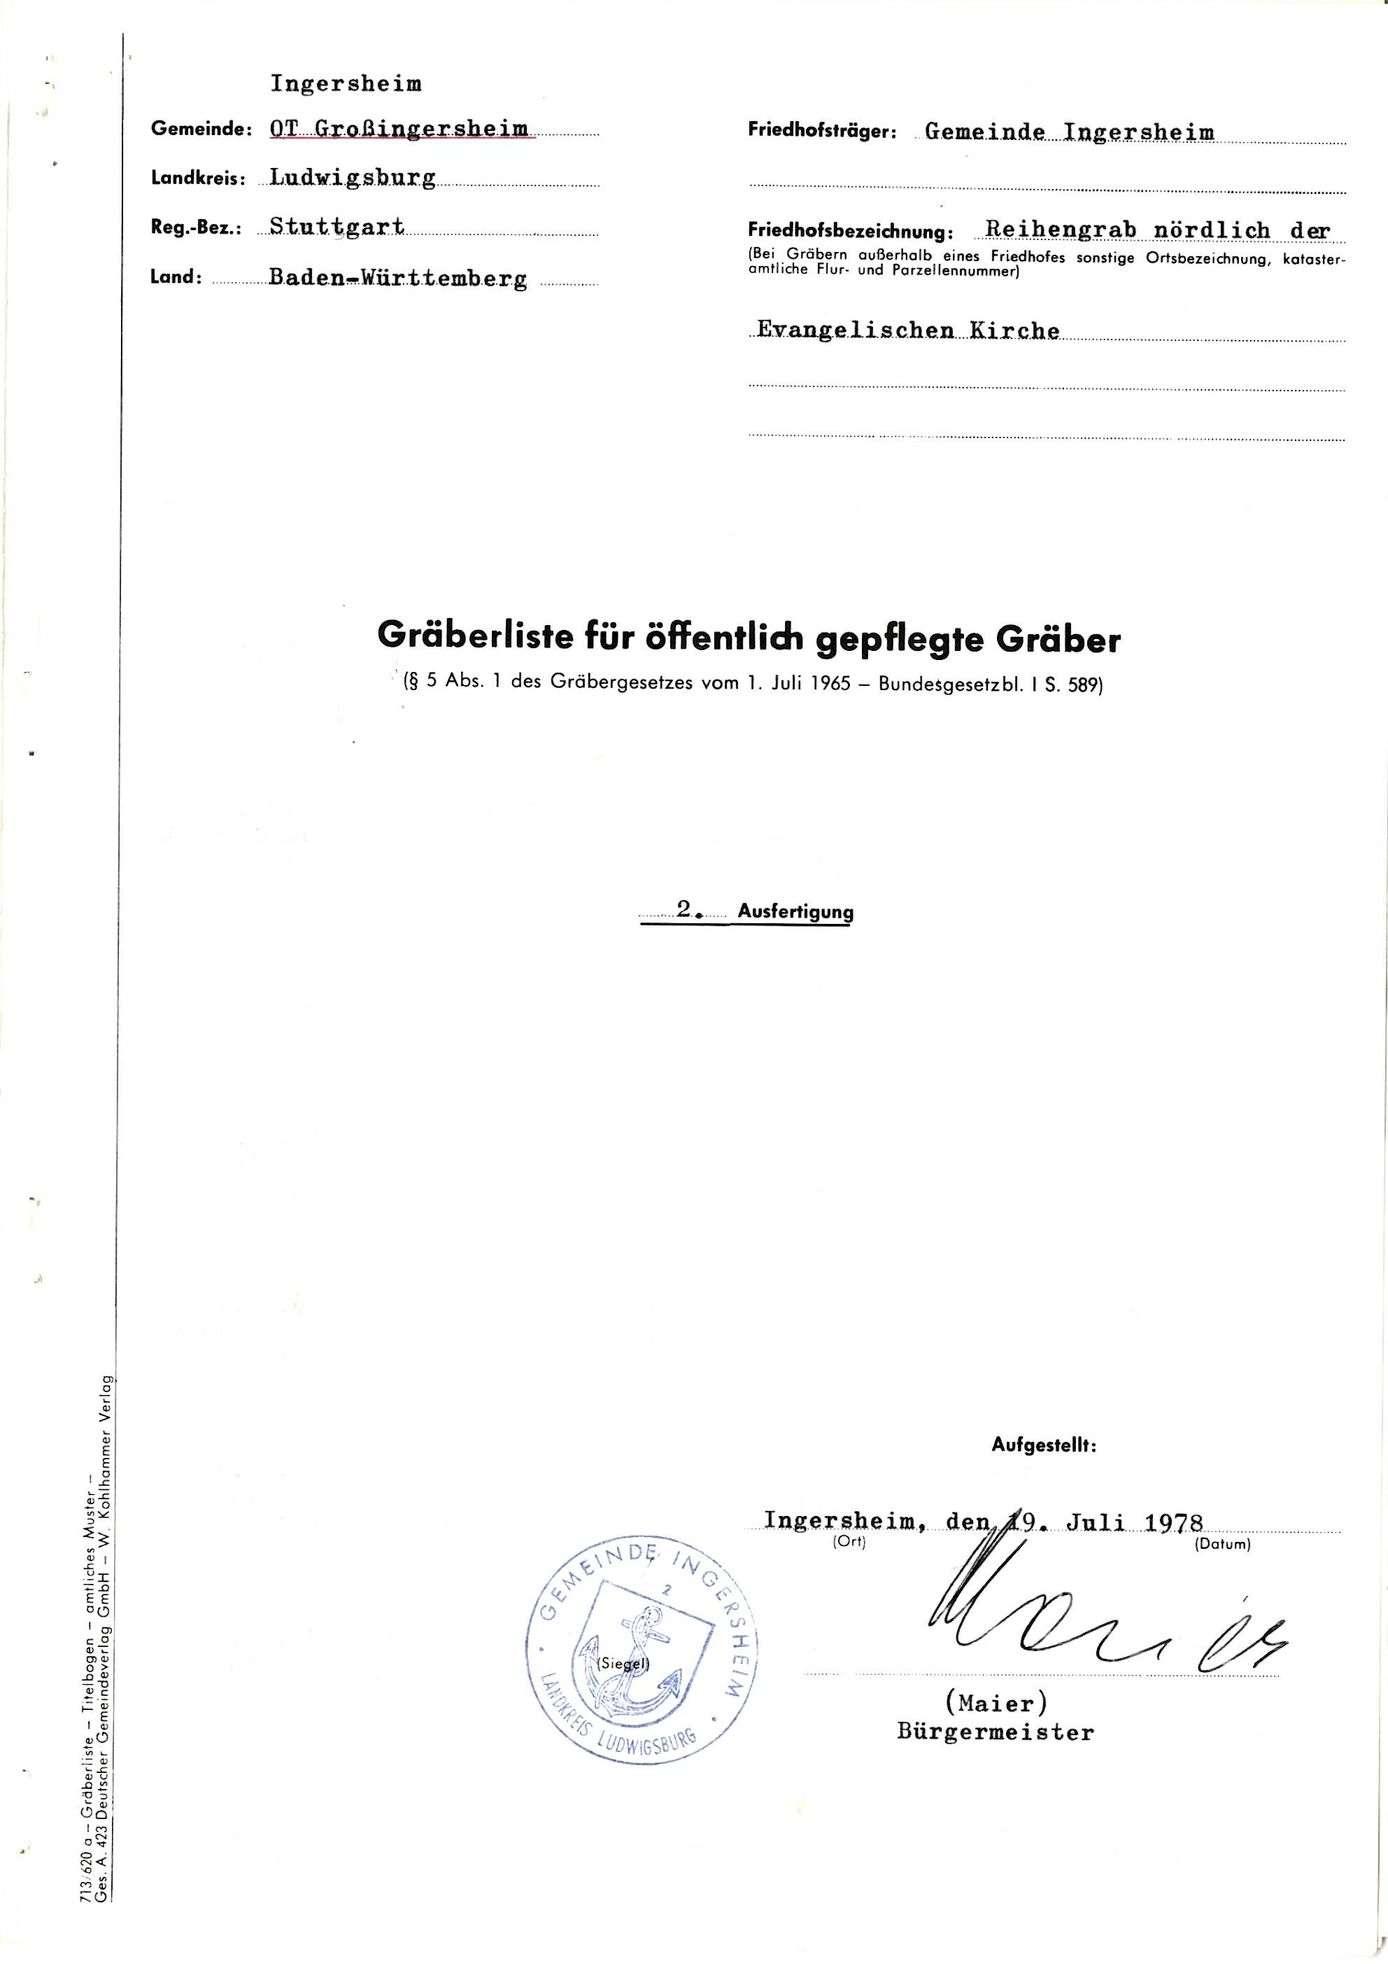 Großingersheim, Bild 1